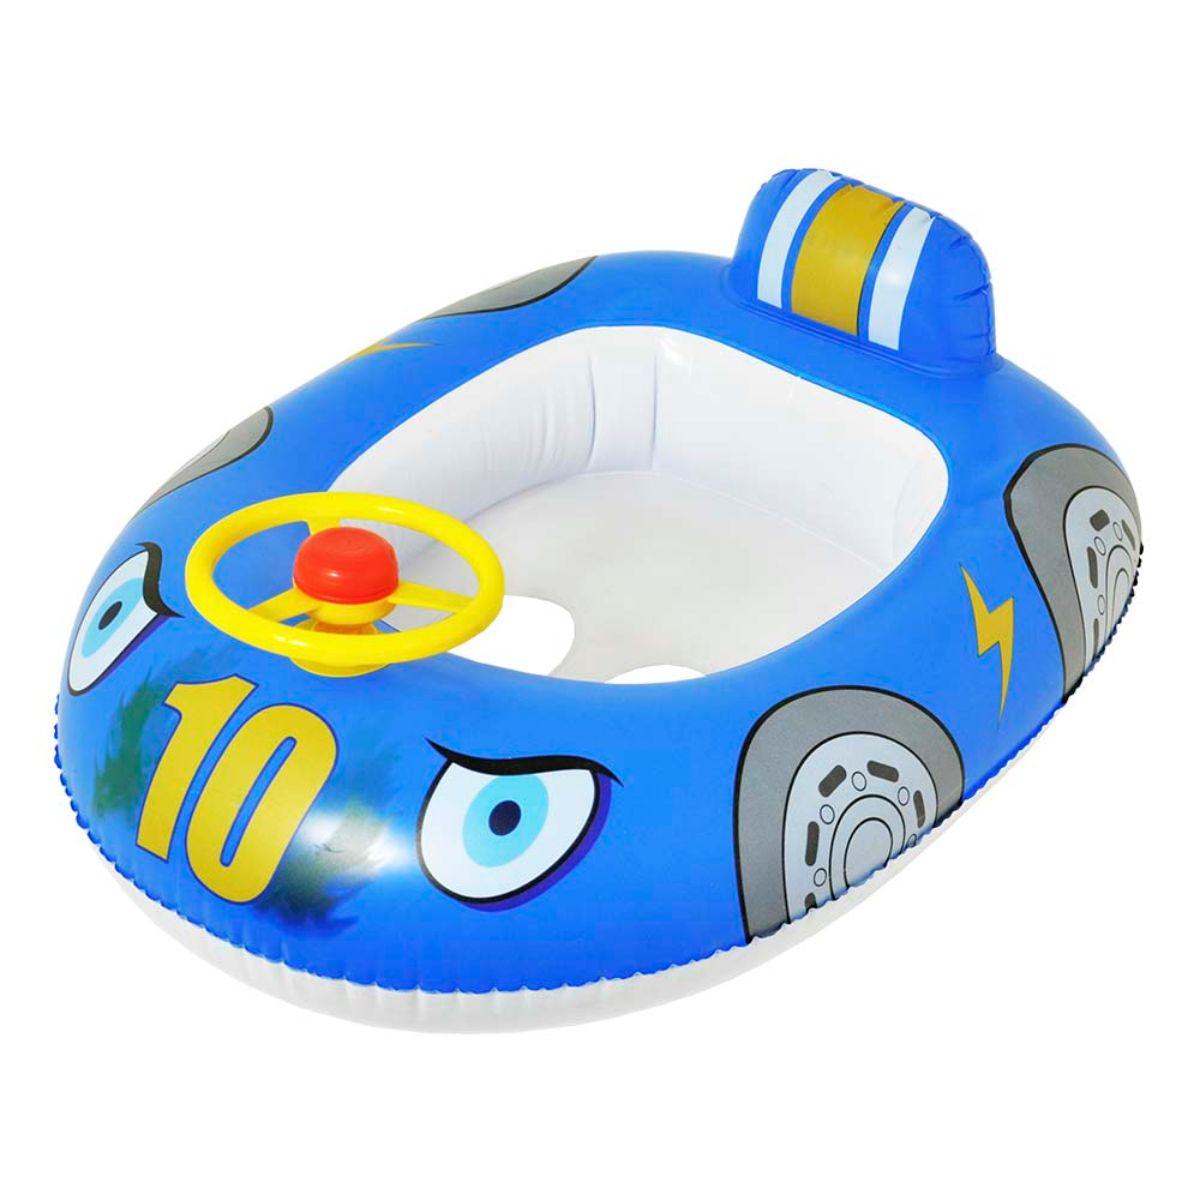 Baby Bote Corrida Divertida DM Toys Infantil